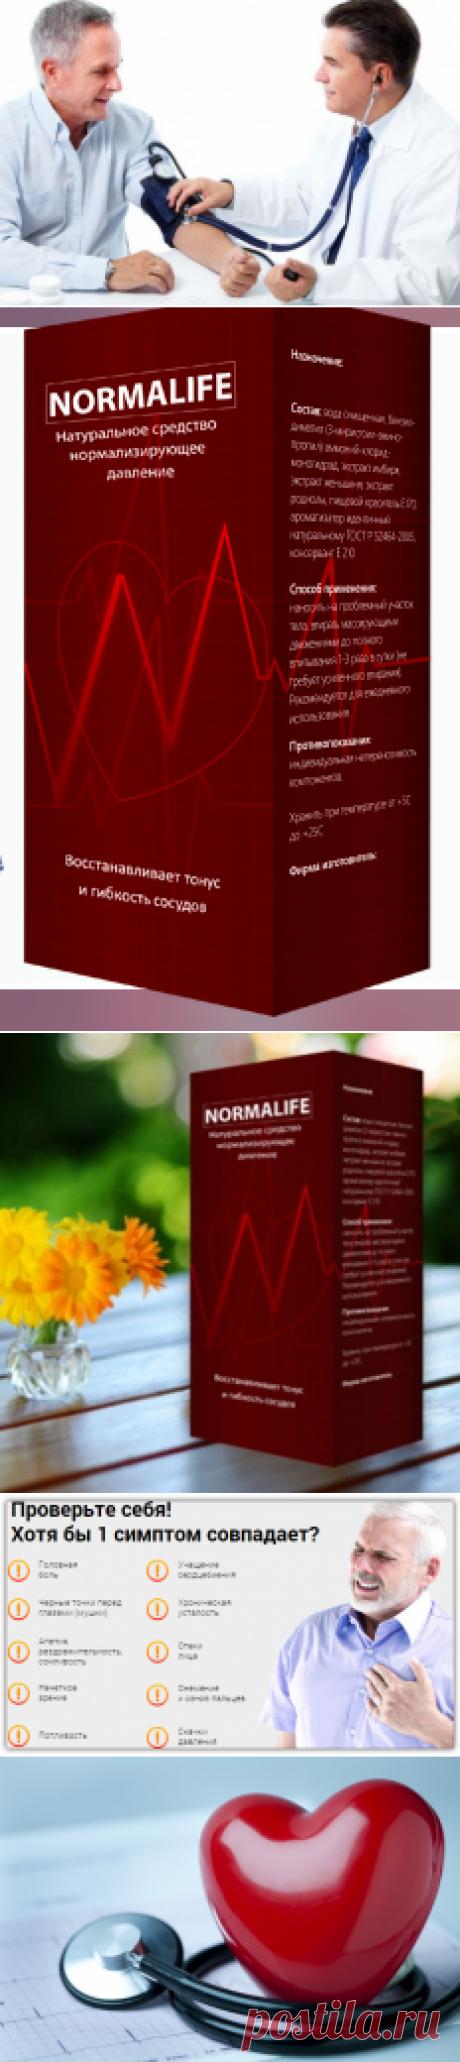 NormaLife инструкция цена